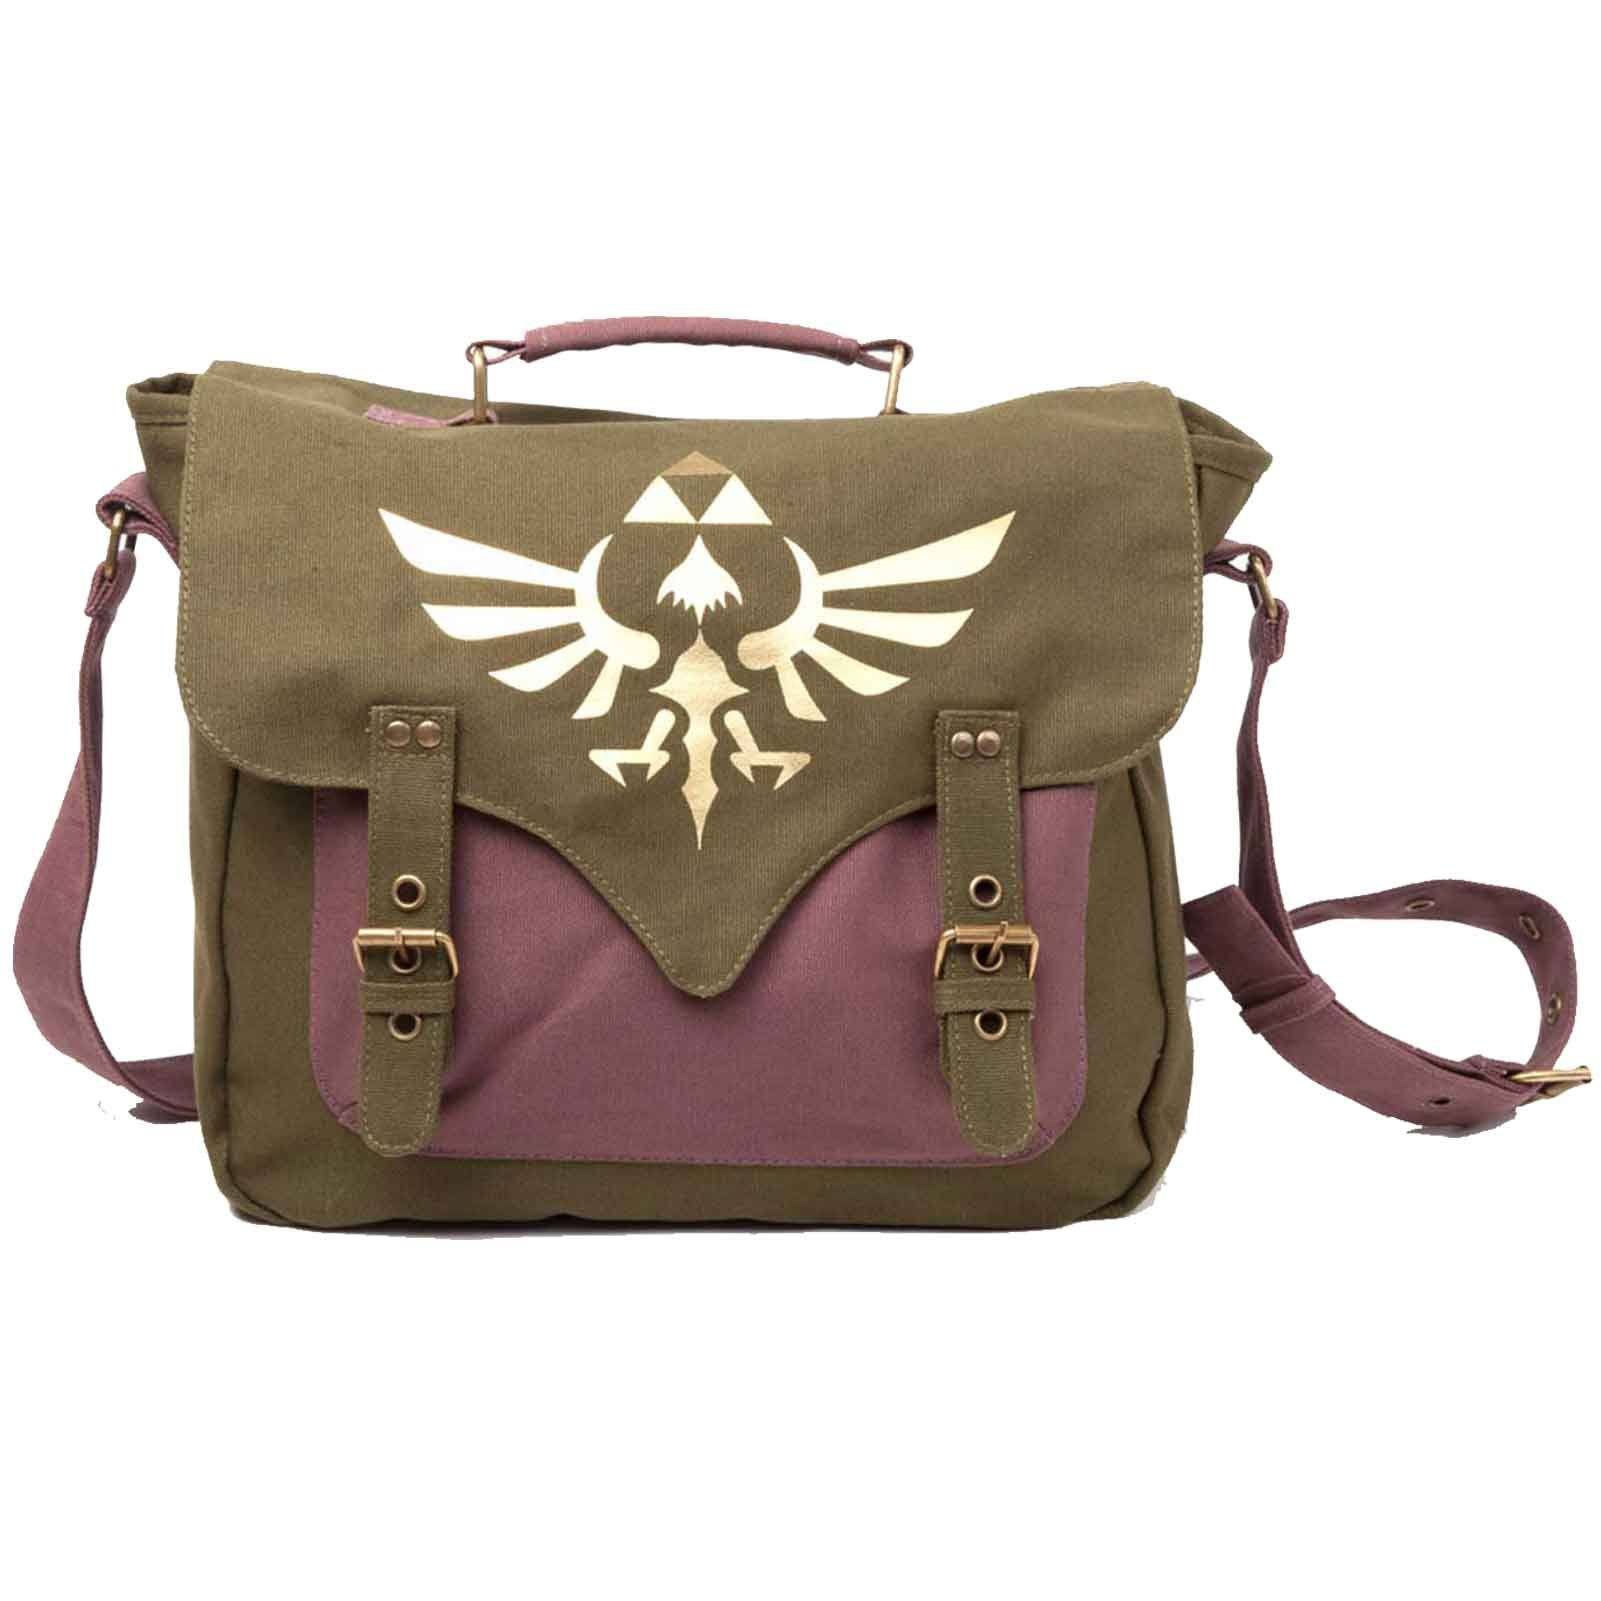 Legend Of Zelda Messenger Bag Golden Triforce Logo Skyward Sword Official